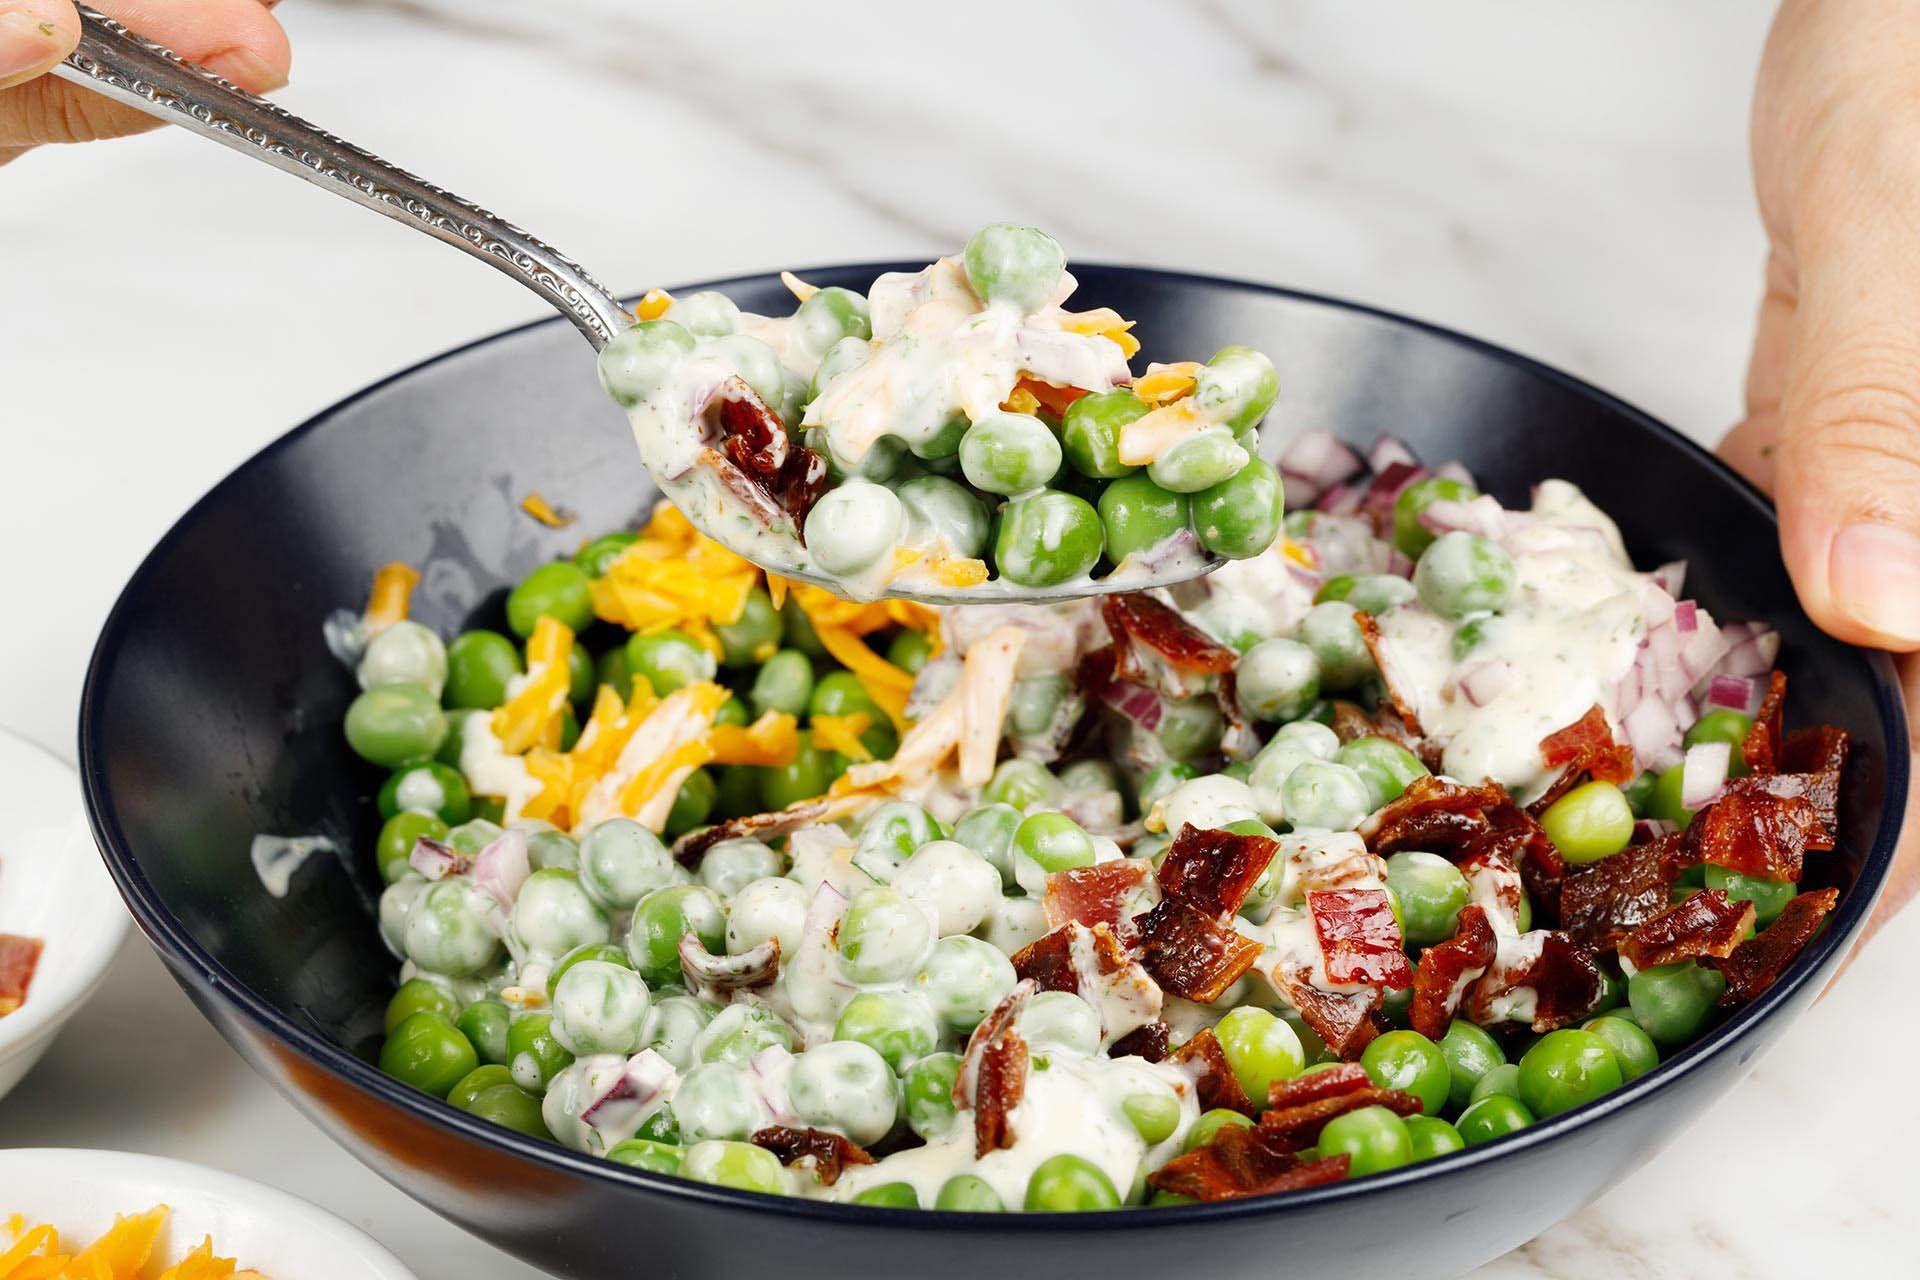 step 3: toss the salad